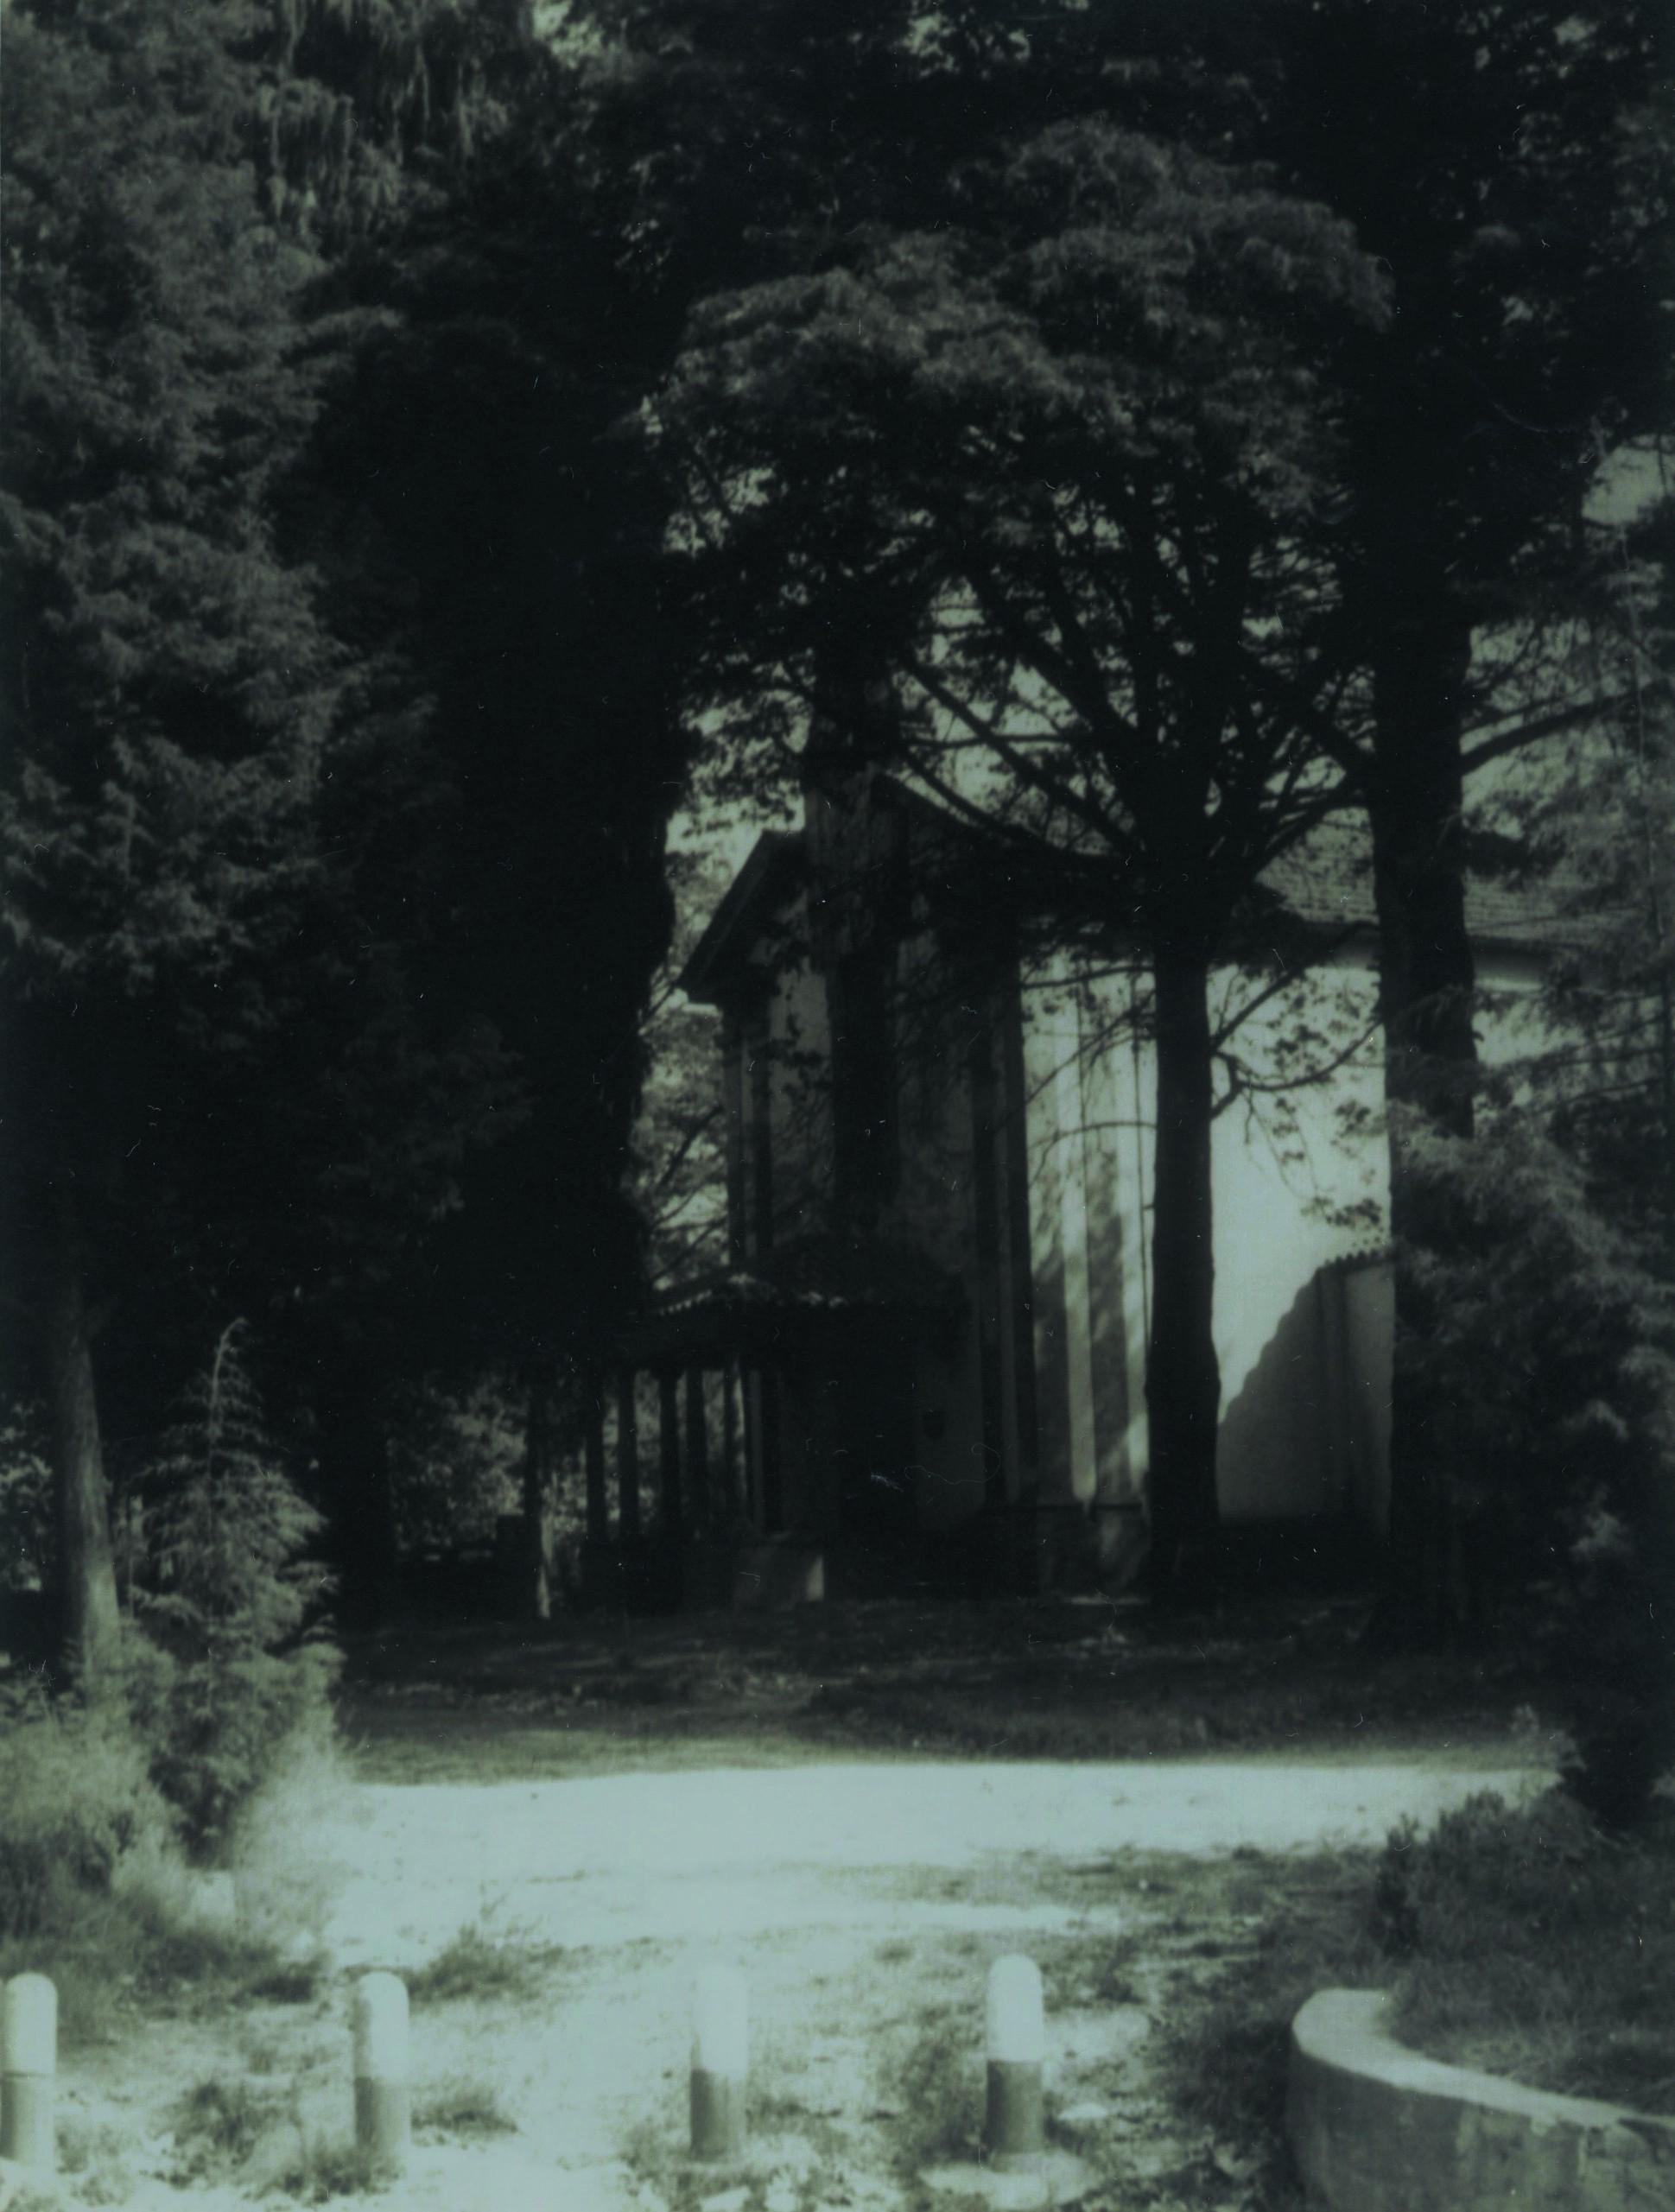 Capela do Sr. da Campa, Santiago de Riba-Ul (Anos 80)